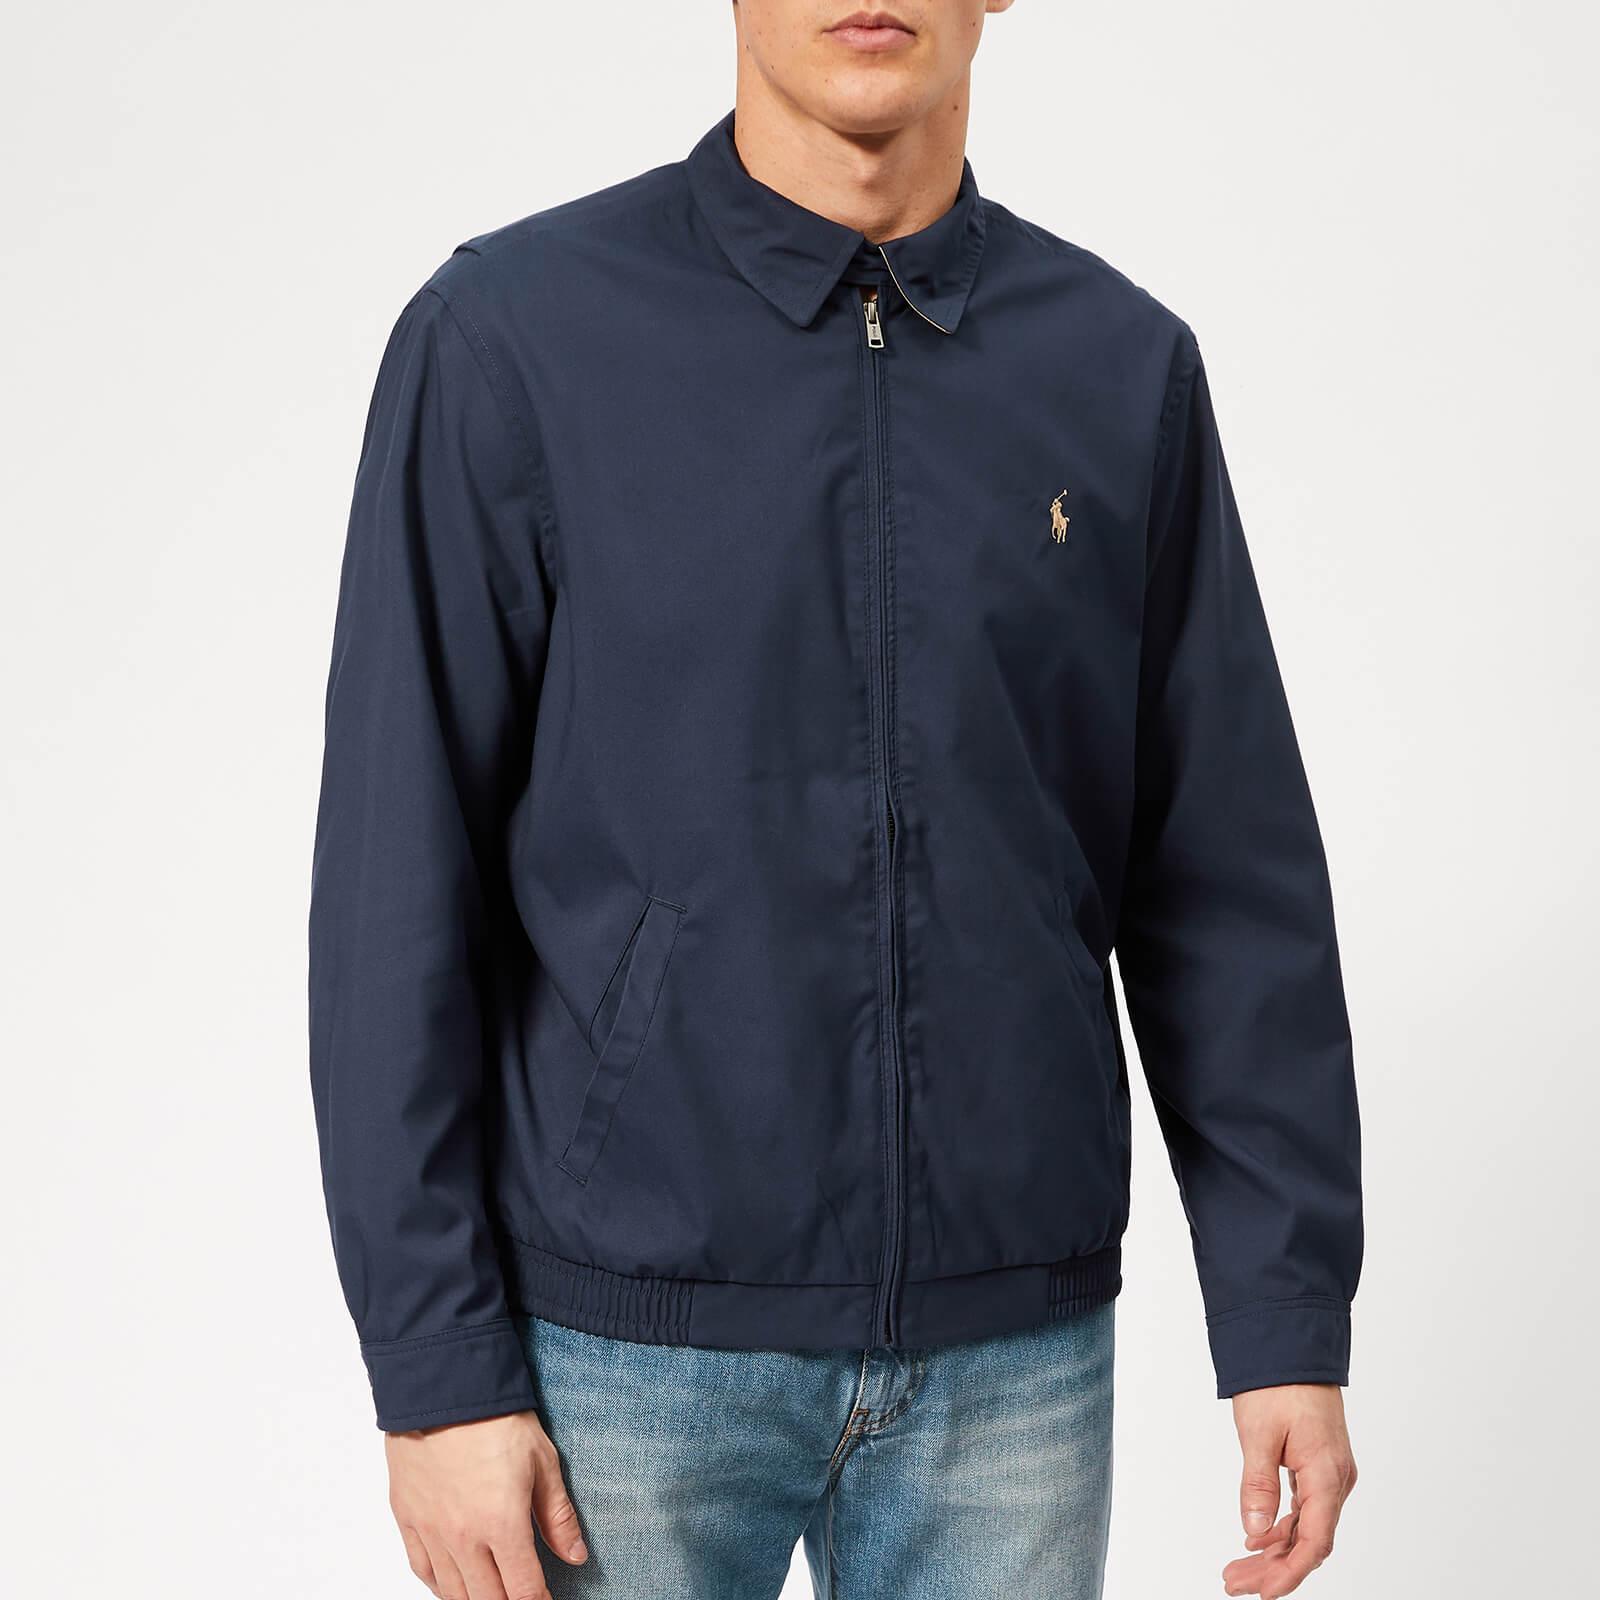 88adffa943cf54 Polo Ralph Lauren Men's Bi-Swing Jacket - French Navy - Free UK Delivery  over £50